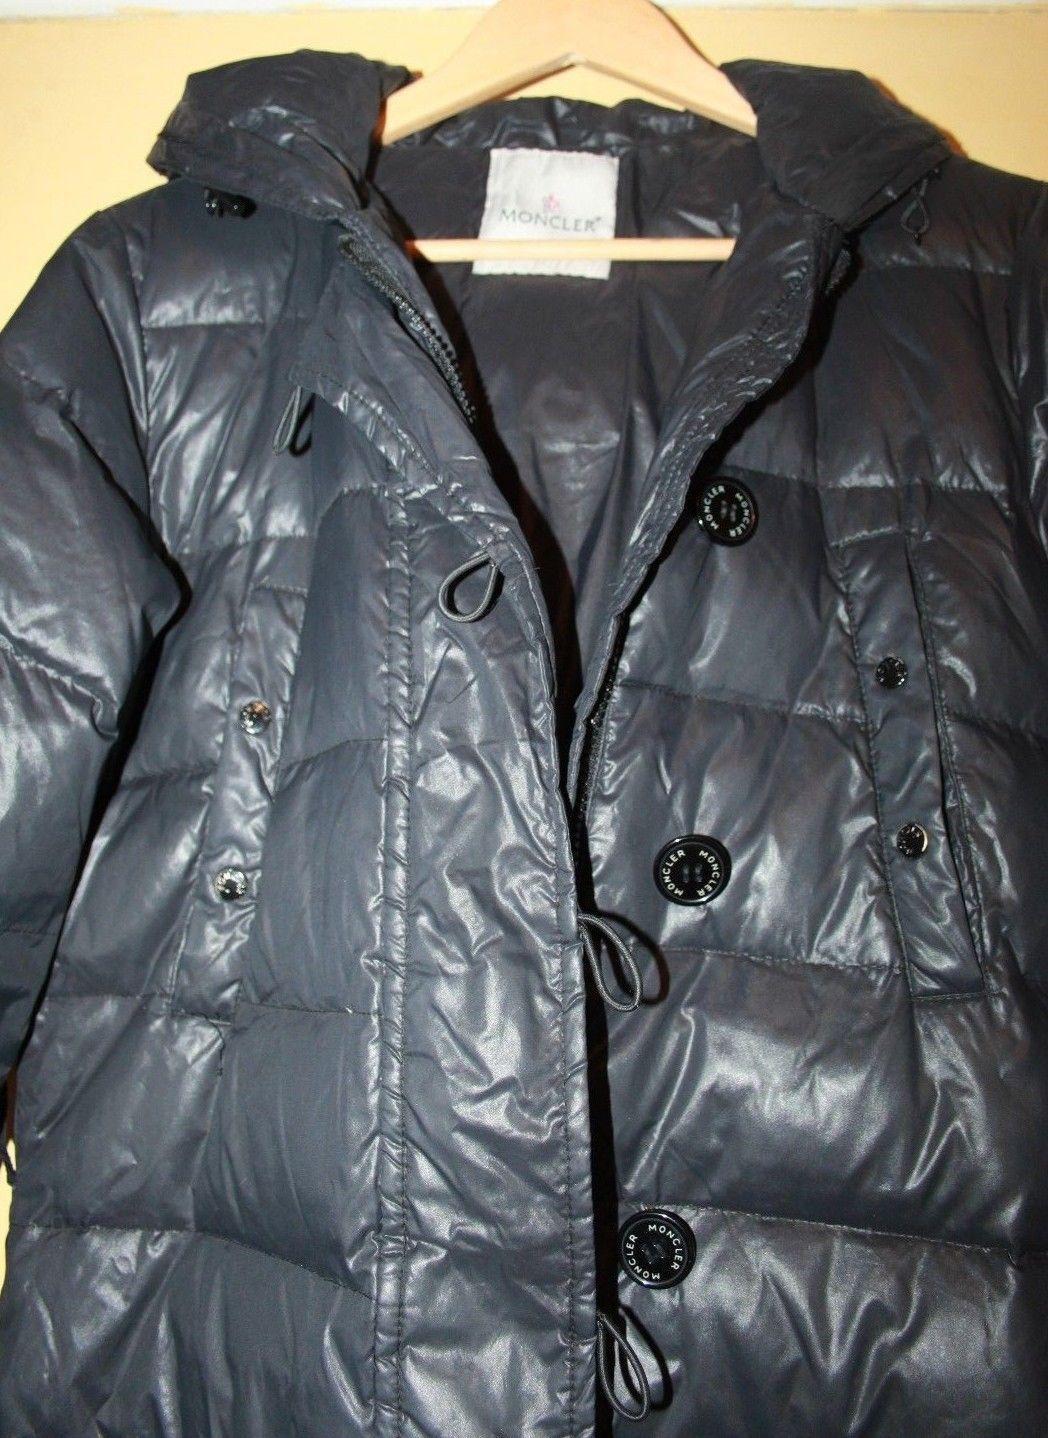 9210c709a Moncler Pop Star Black Down Puffer Hooded Jacket Coat Size 2 UK 10 ...